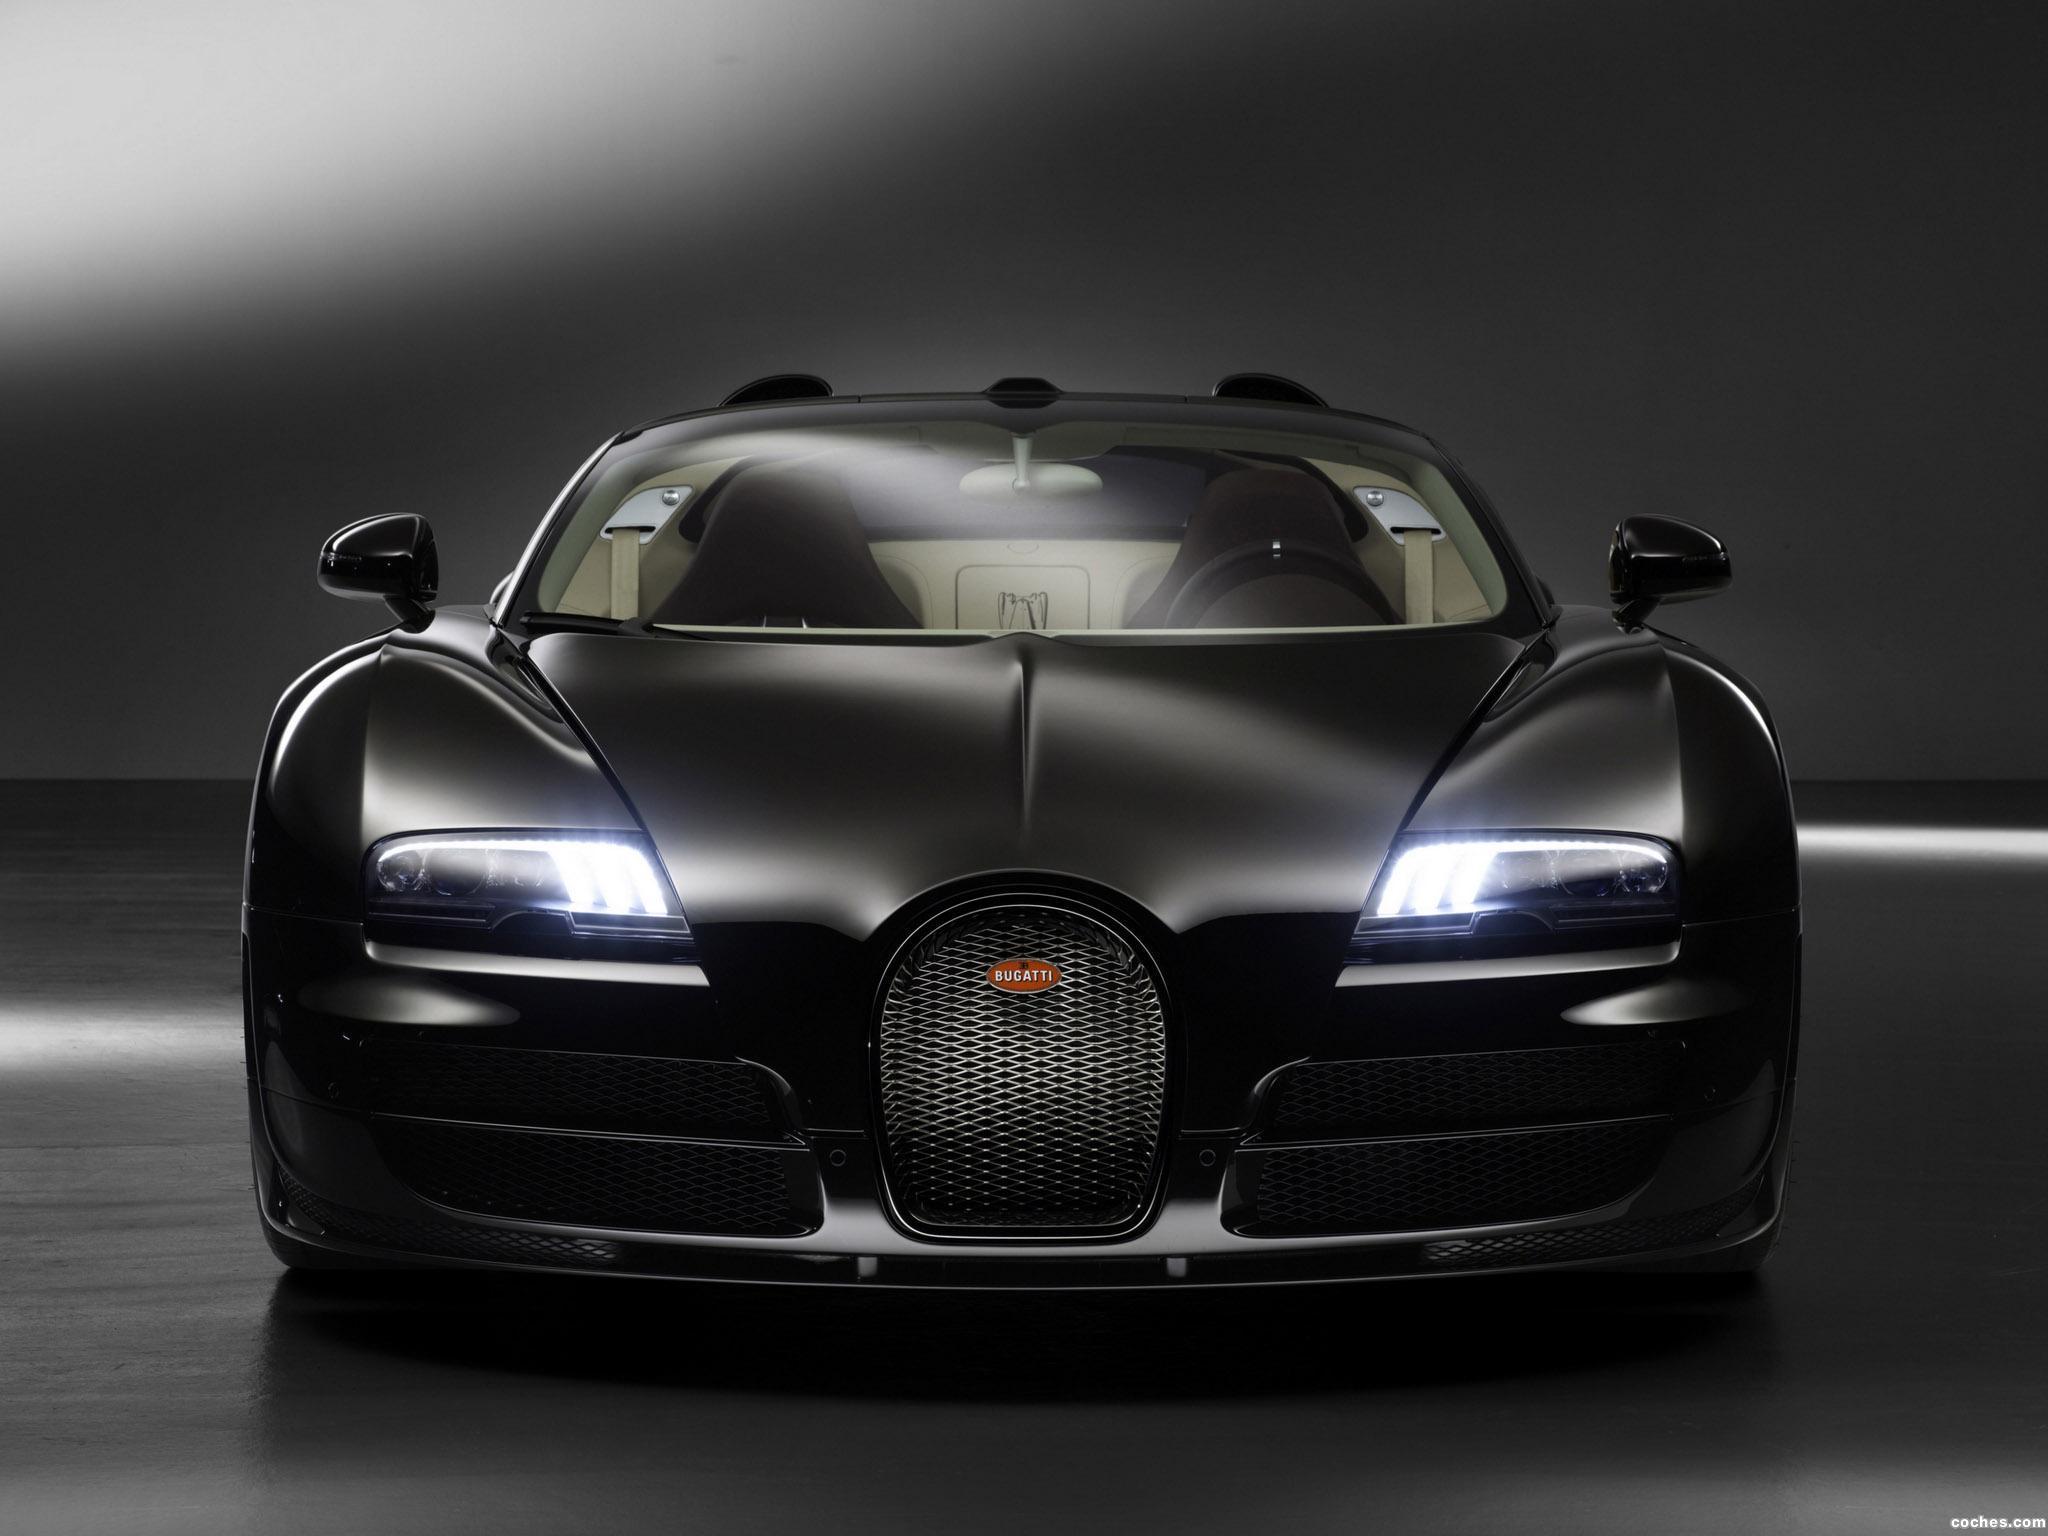 bugatti_veyron-grand-sport-roadster-vitesse-jean-bugatti-2013_r8 Remarkable Bugatti Veyron Grand Sport Vitesse Informacion Cars Trend